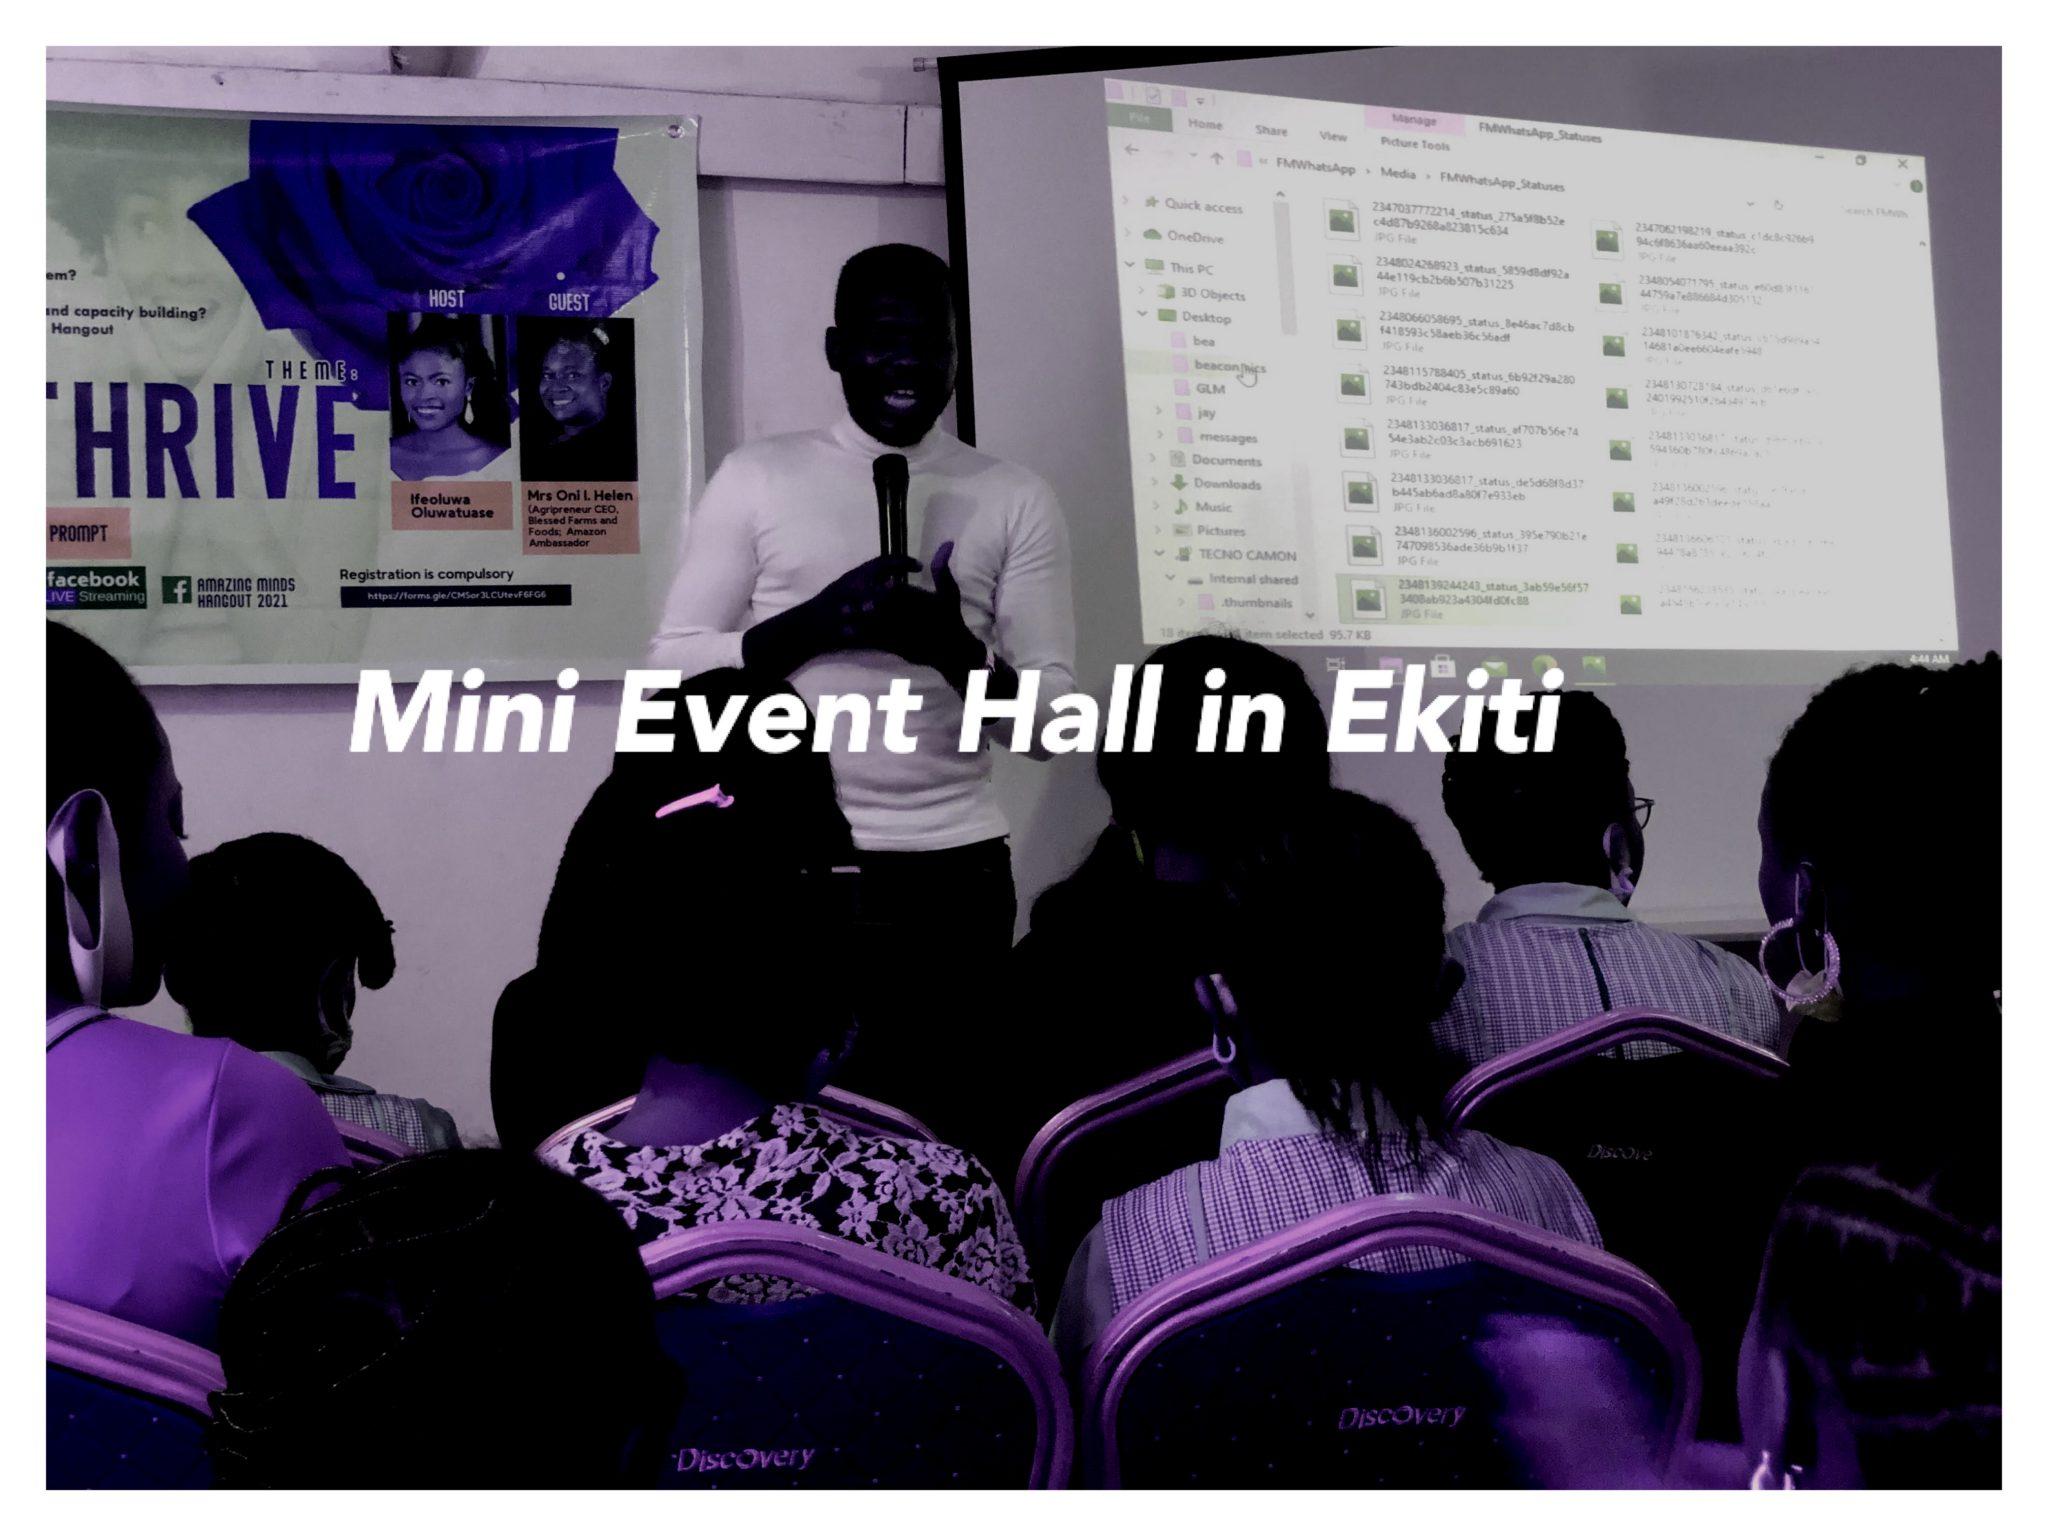 mini event hall in ekiti